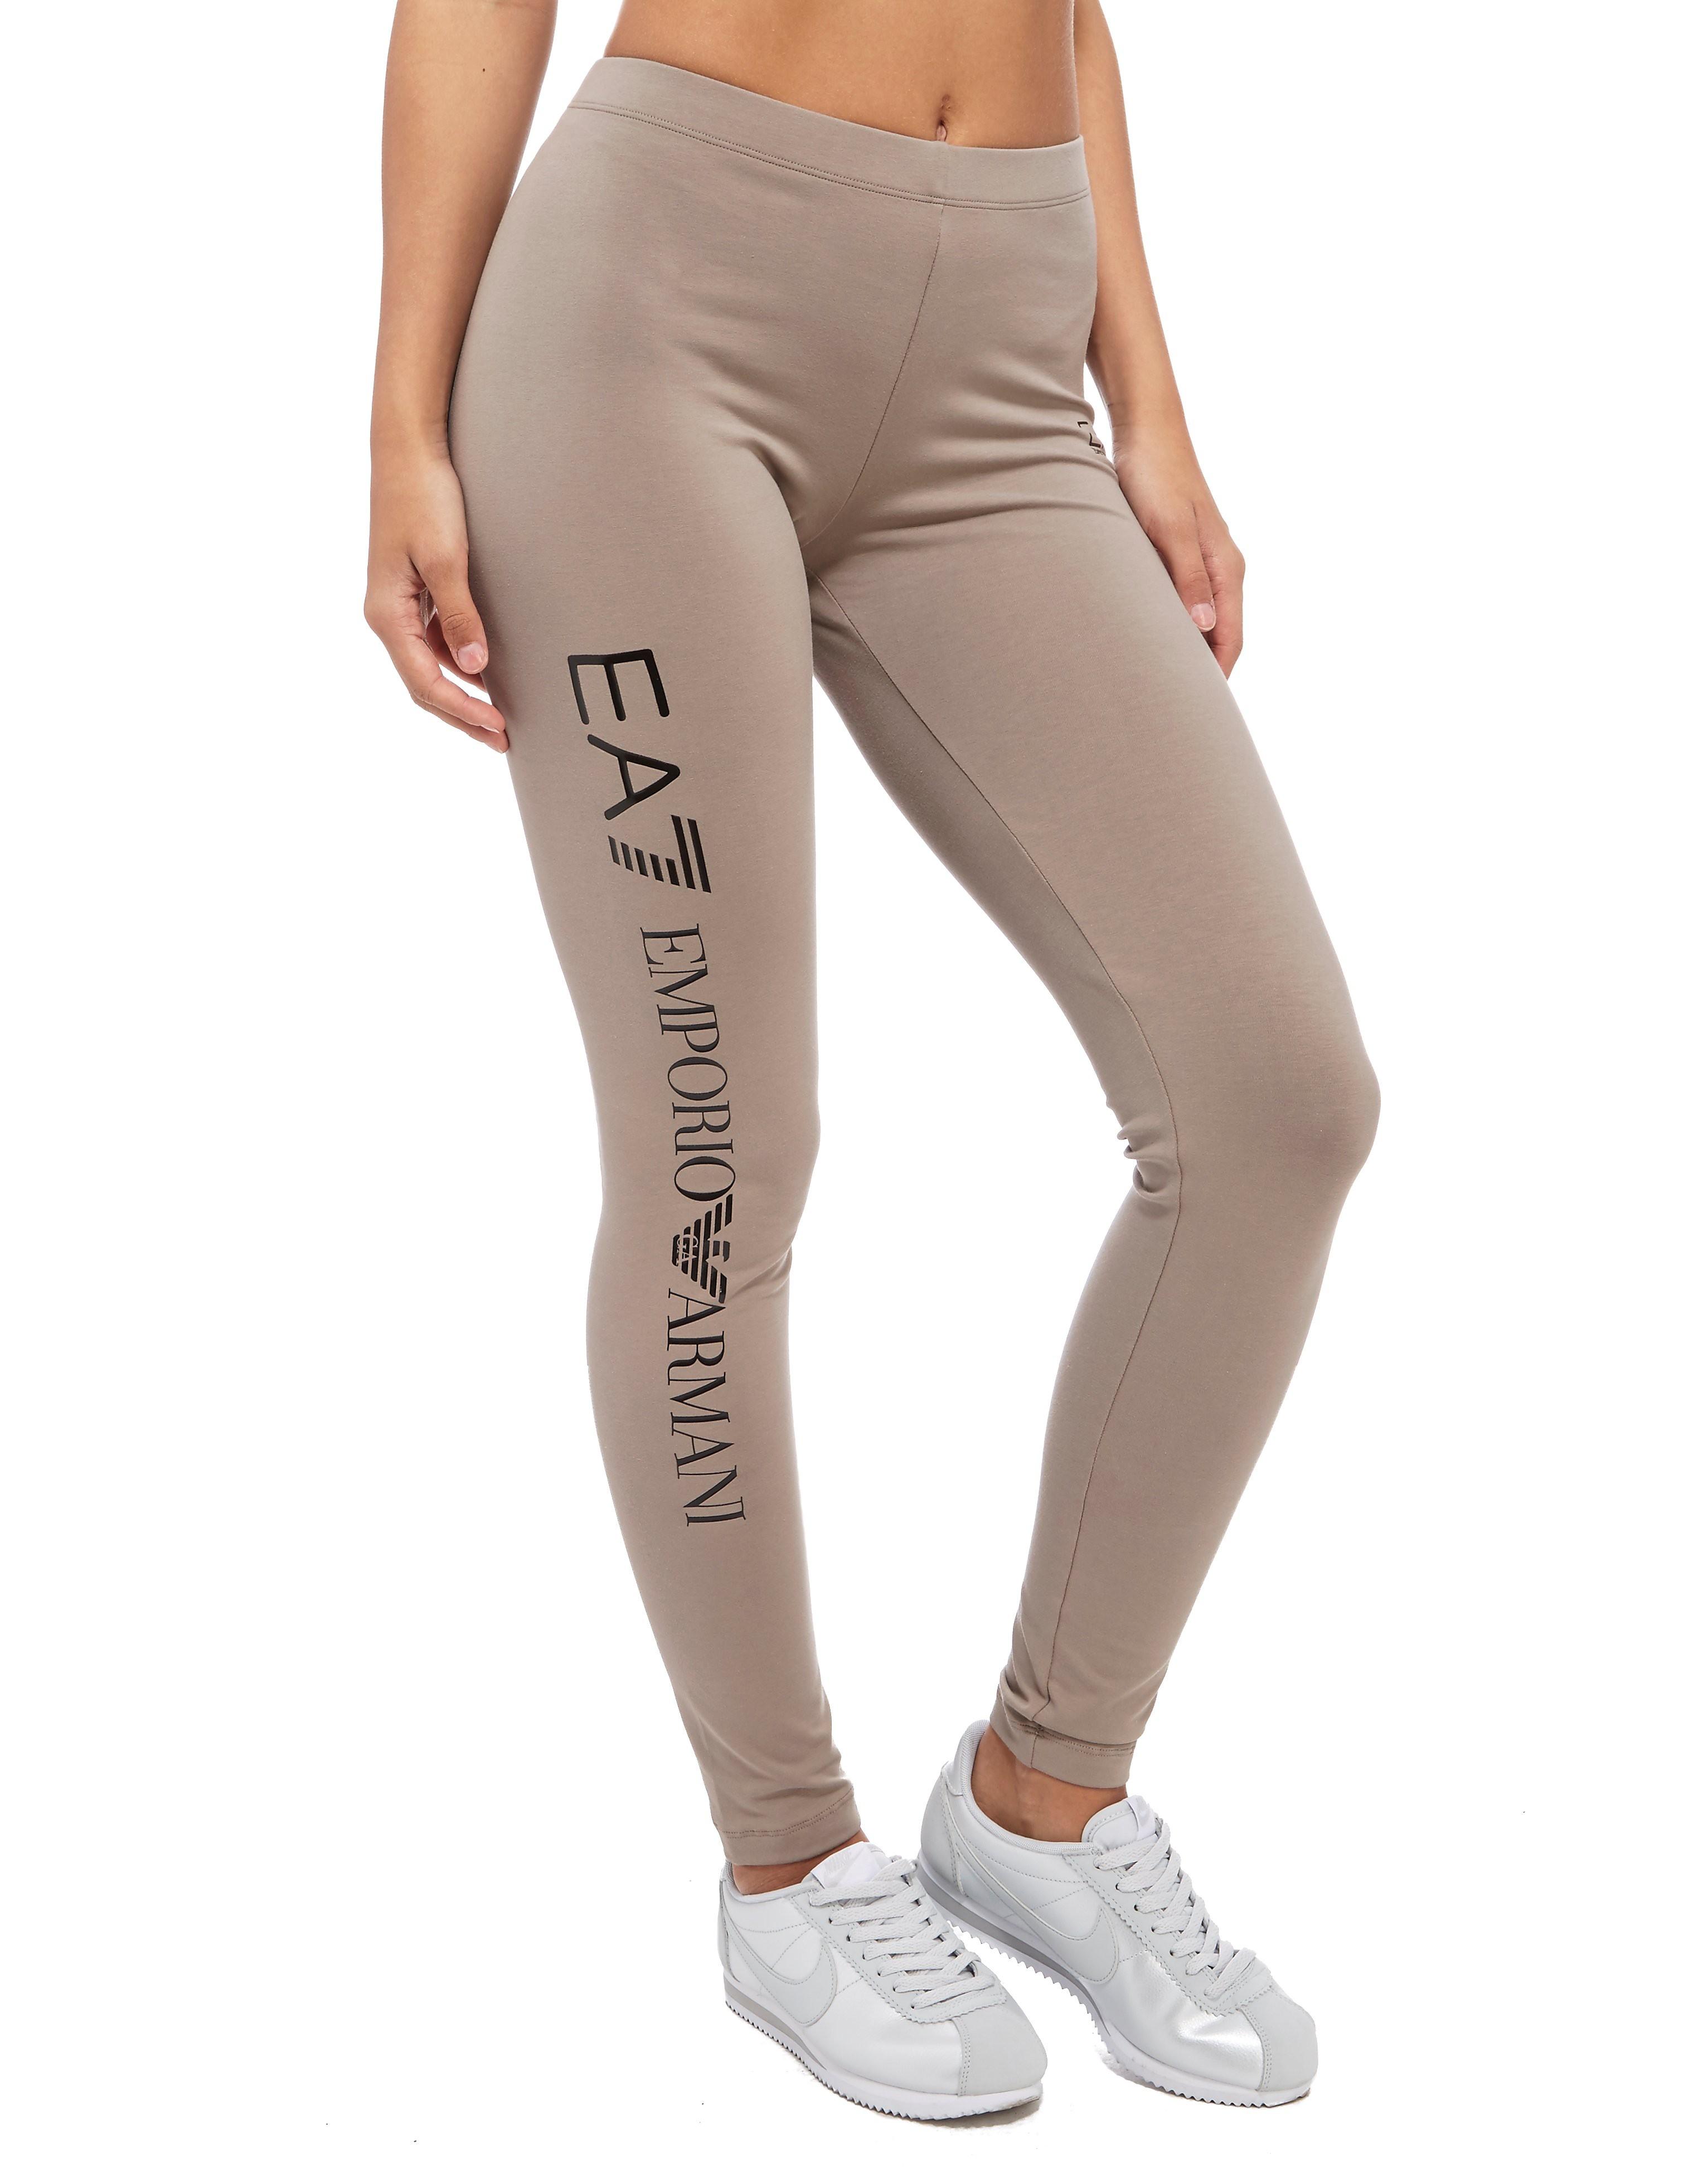 Emporio Armani EA7 Leggings Dames